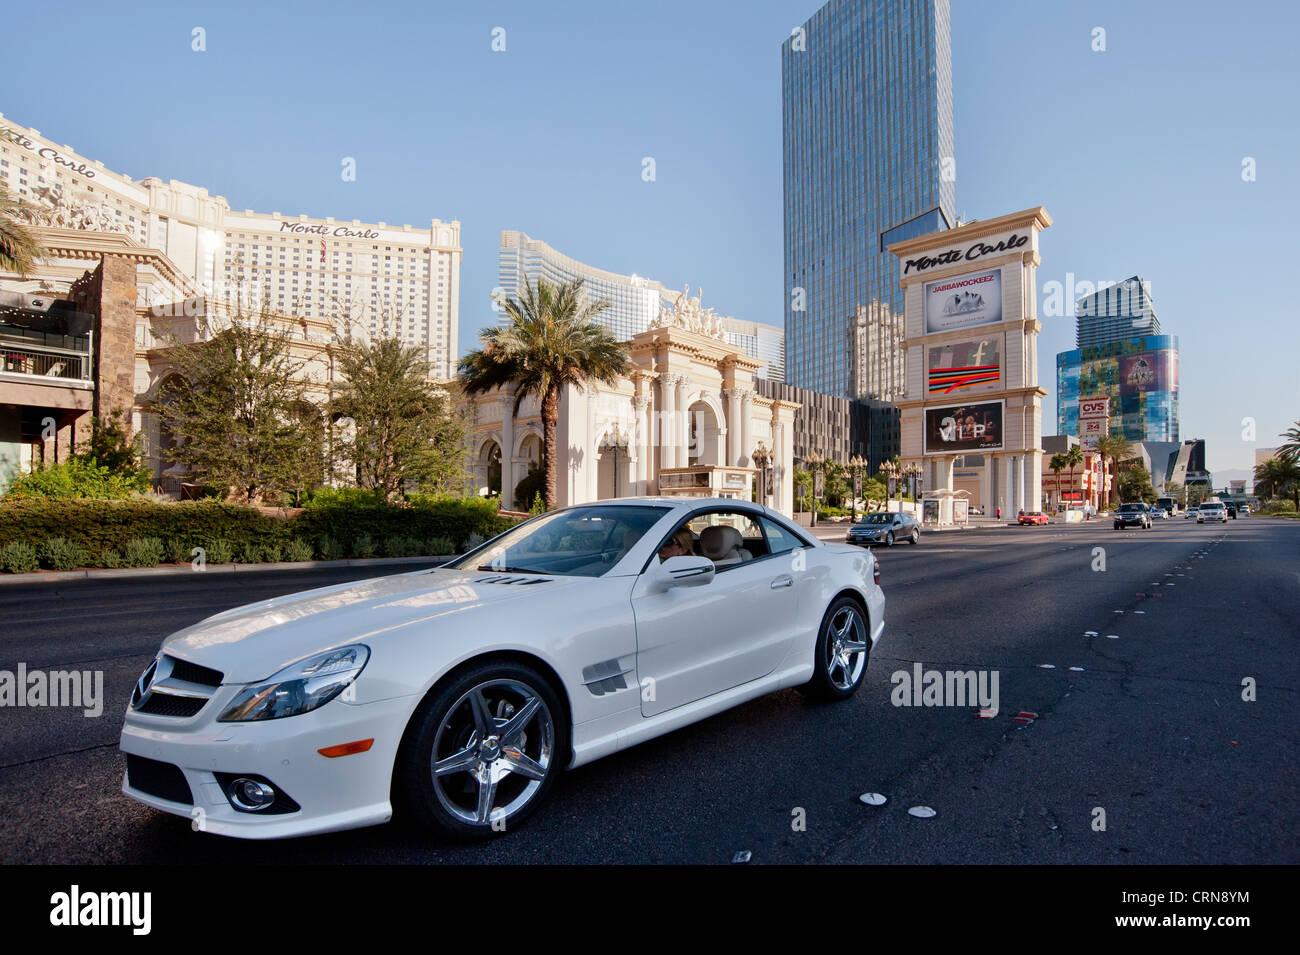 Mercedes Benz Las Vegas >> Mercedes Benz Sports Car In Front Of Monte Carlo Hotel On Las Vegas